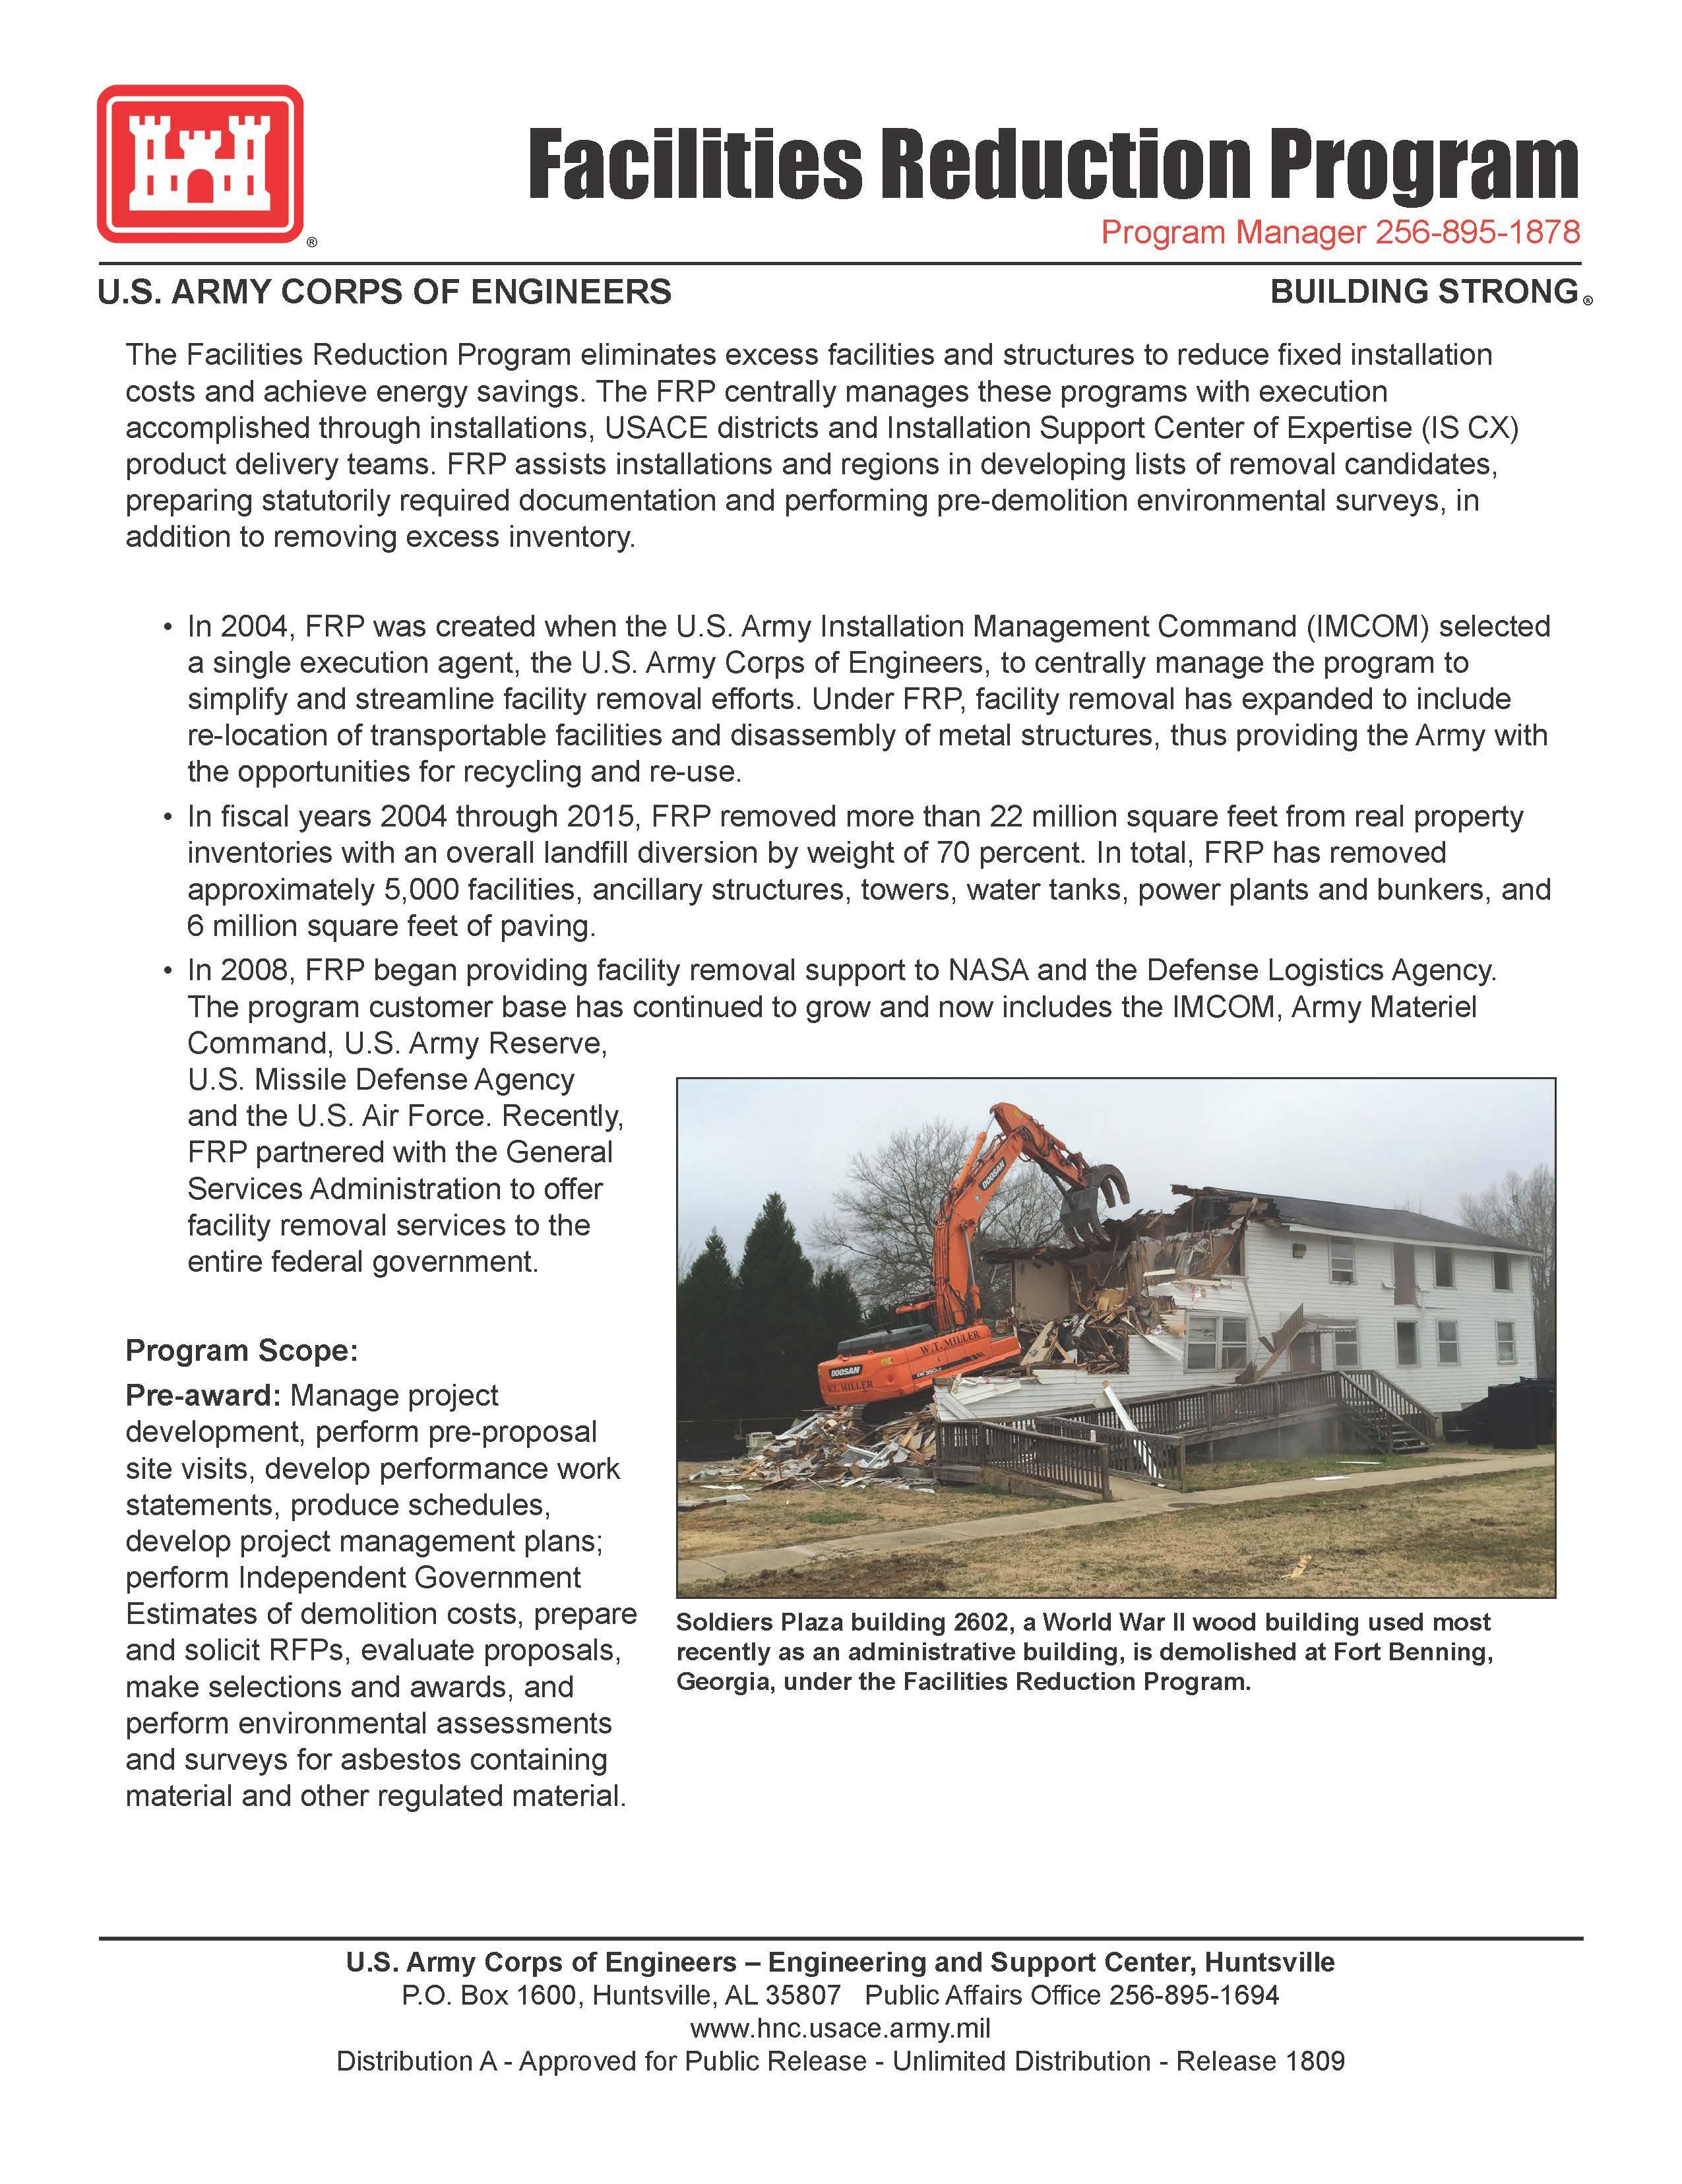 Facilities Division - Facilities Reduction Program > U S